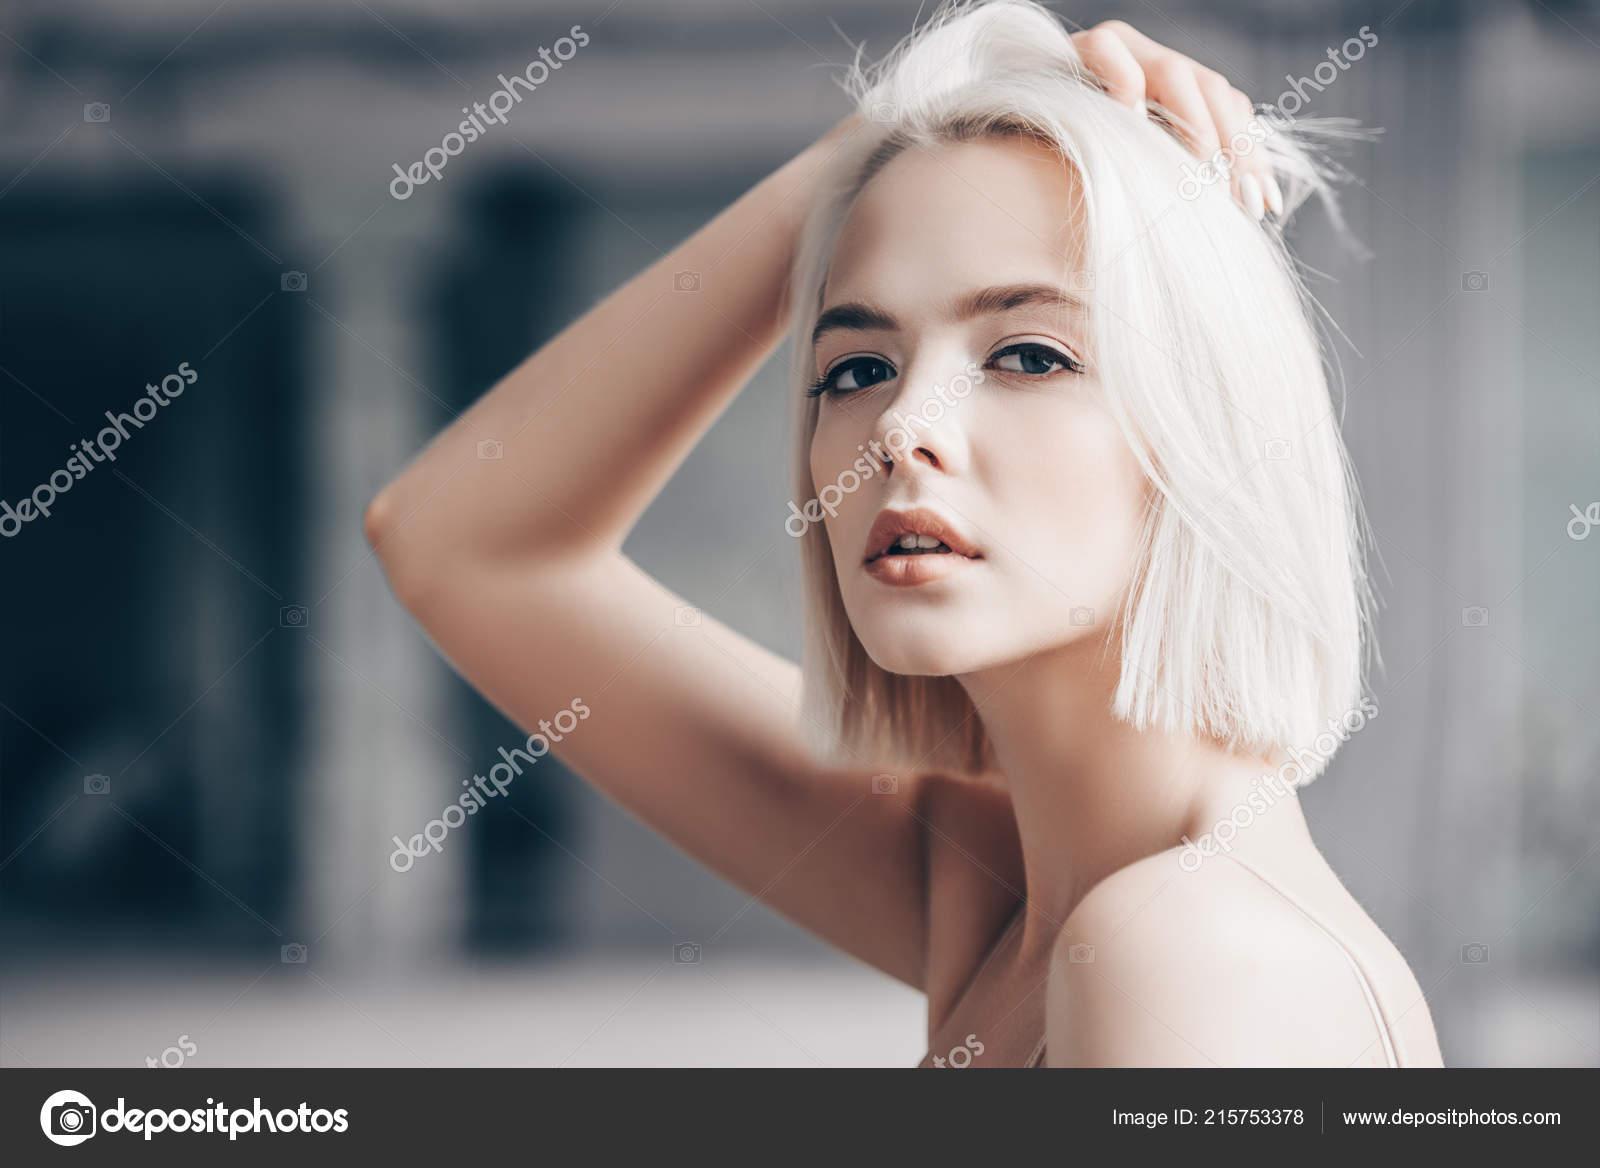 Closeup Portrait Of Young Beautiful Blonde Woman Posing In